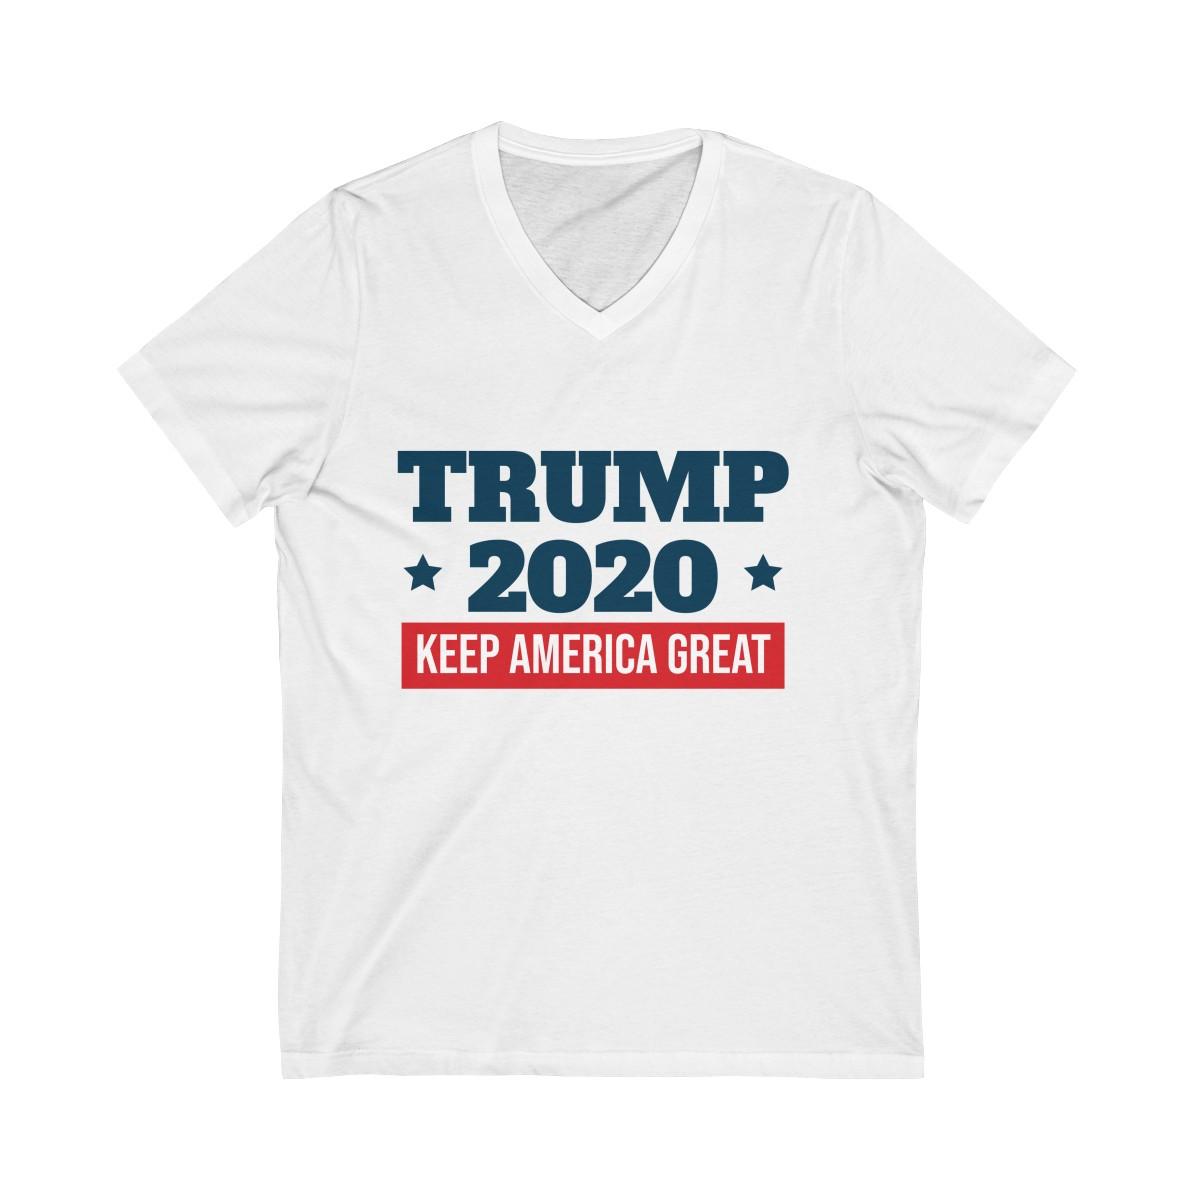 c0b4ef921 Trump 2020 Shirt - Keep America Great V-Neck Tee - Trump 2020 ...